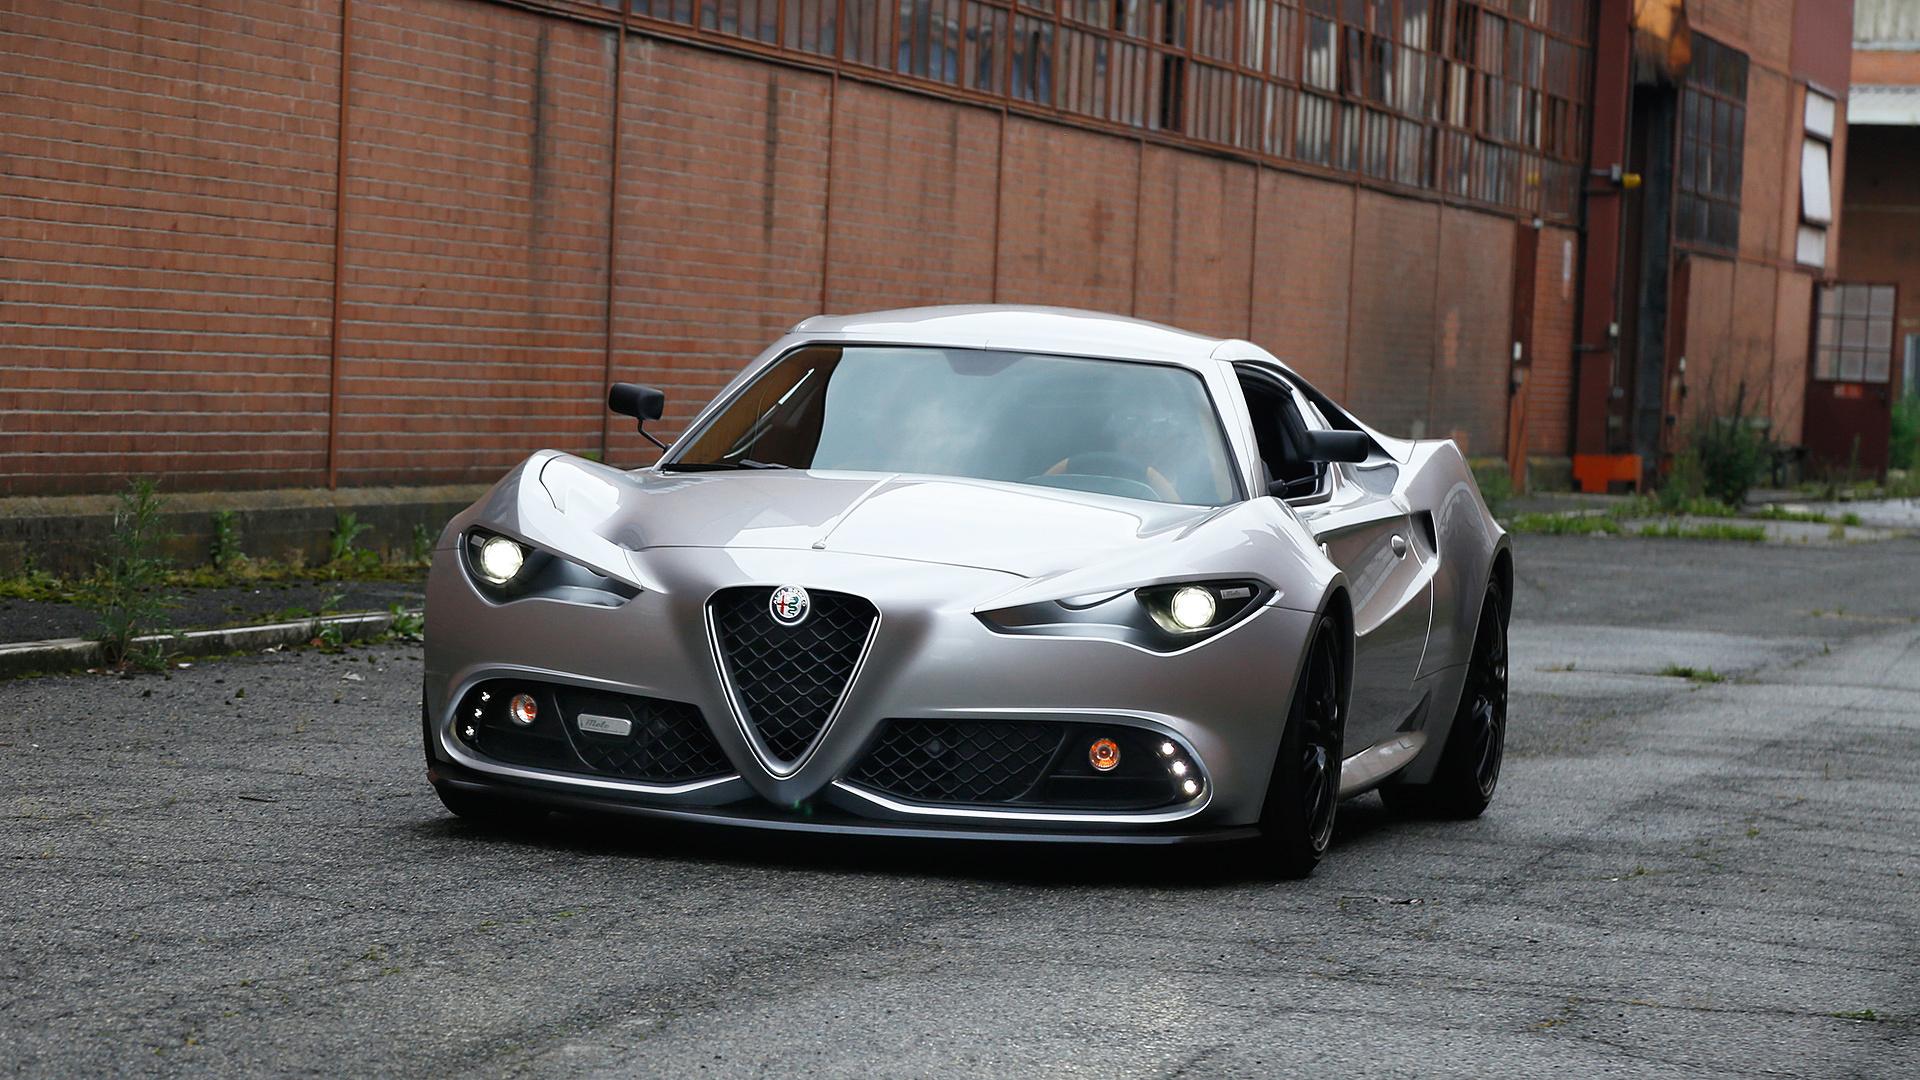 https://www.hartvoorautos.nl/wp-content/uploads/2018/06/Alfa-Romeo-4C-UP-Design-1.jpg